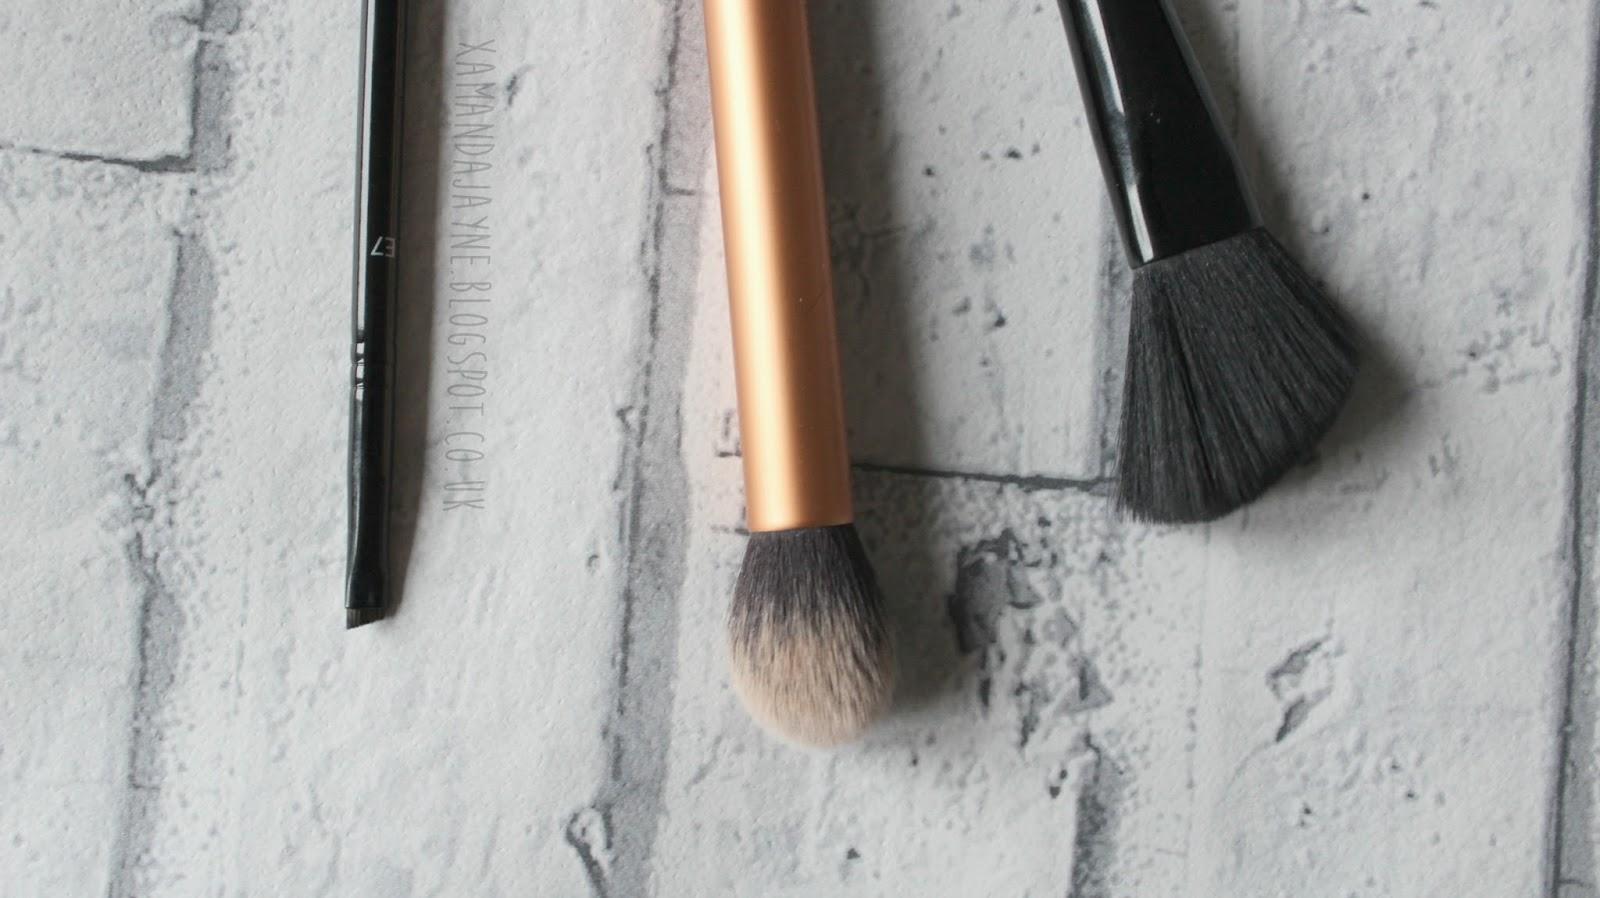 MUA E7, Real Techniques Contour Brush, & MUA F6, review